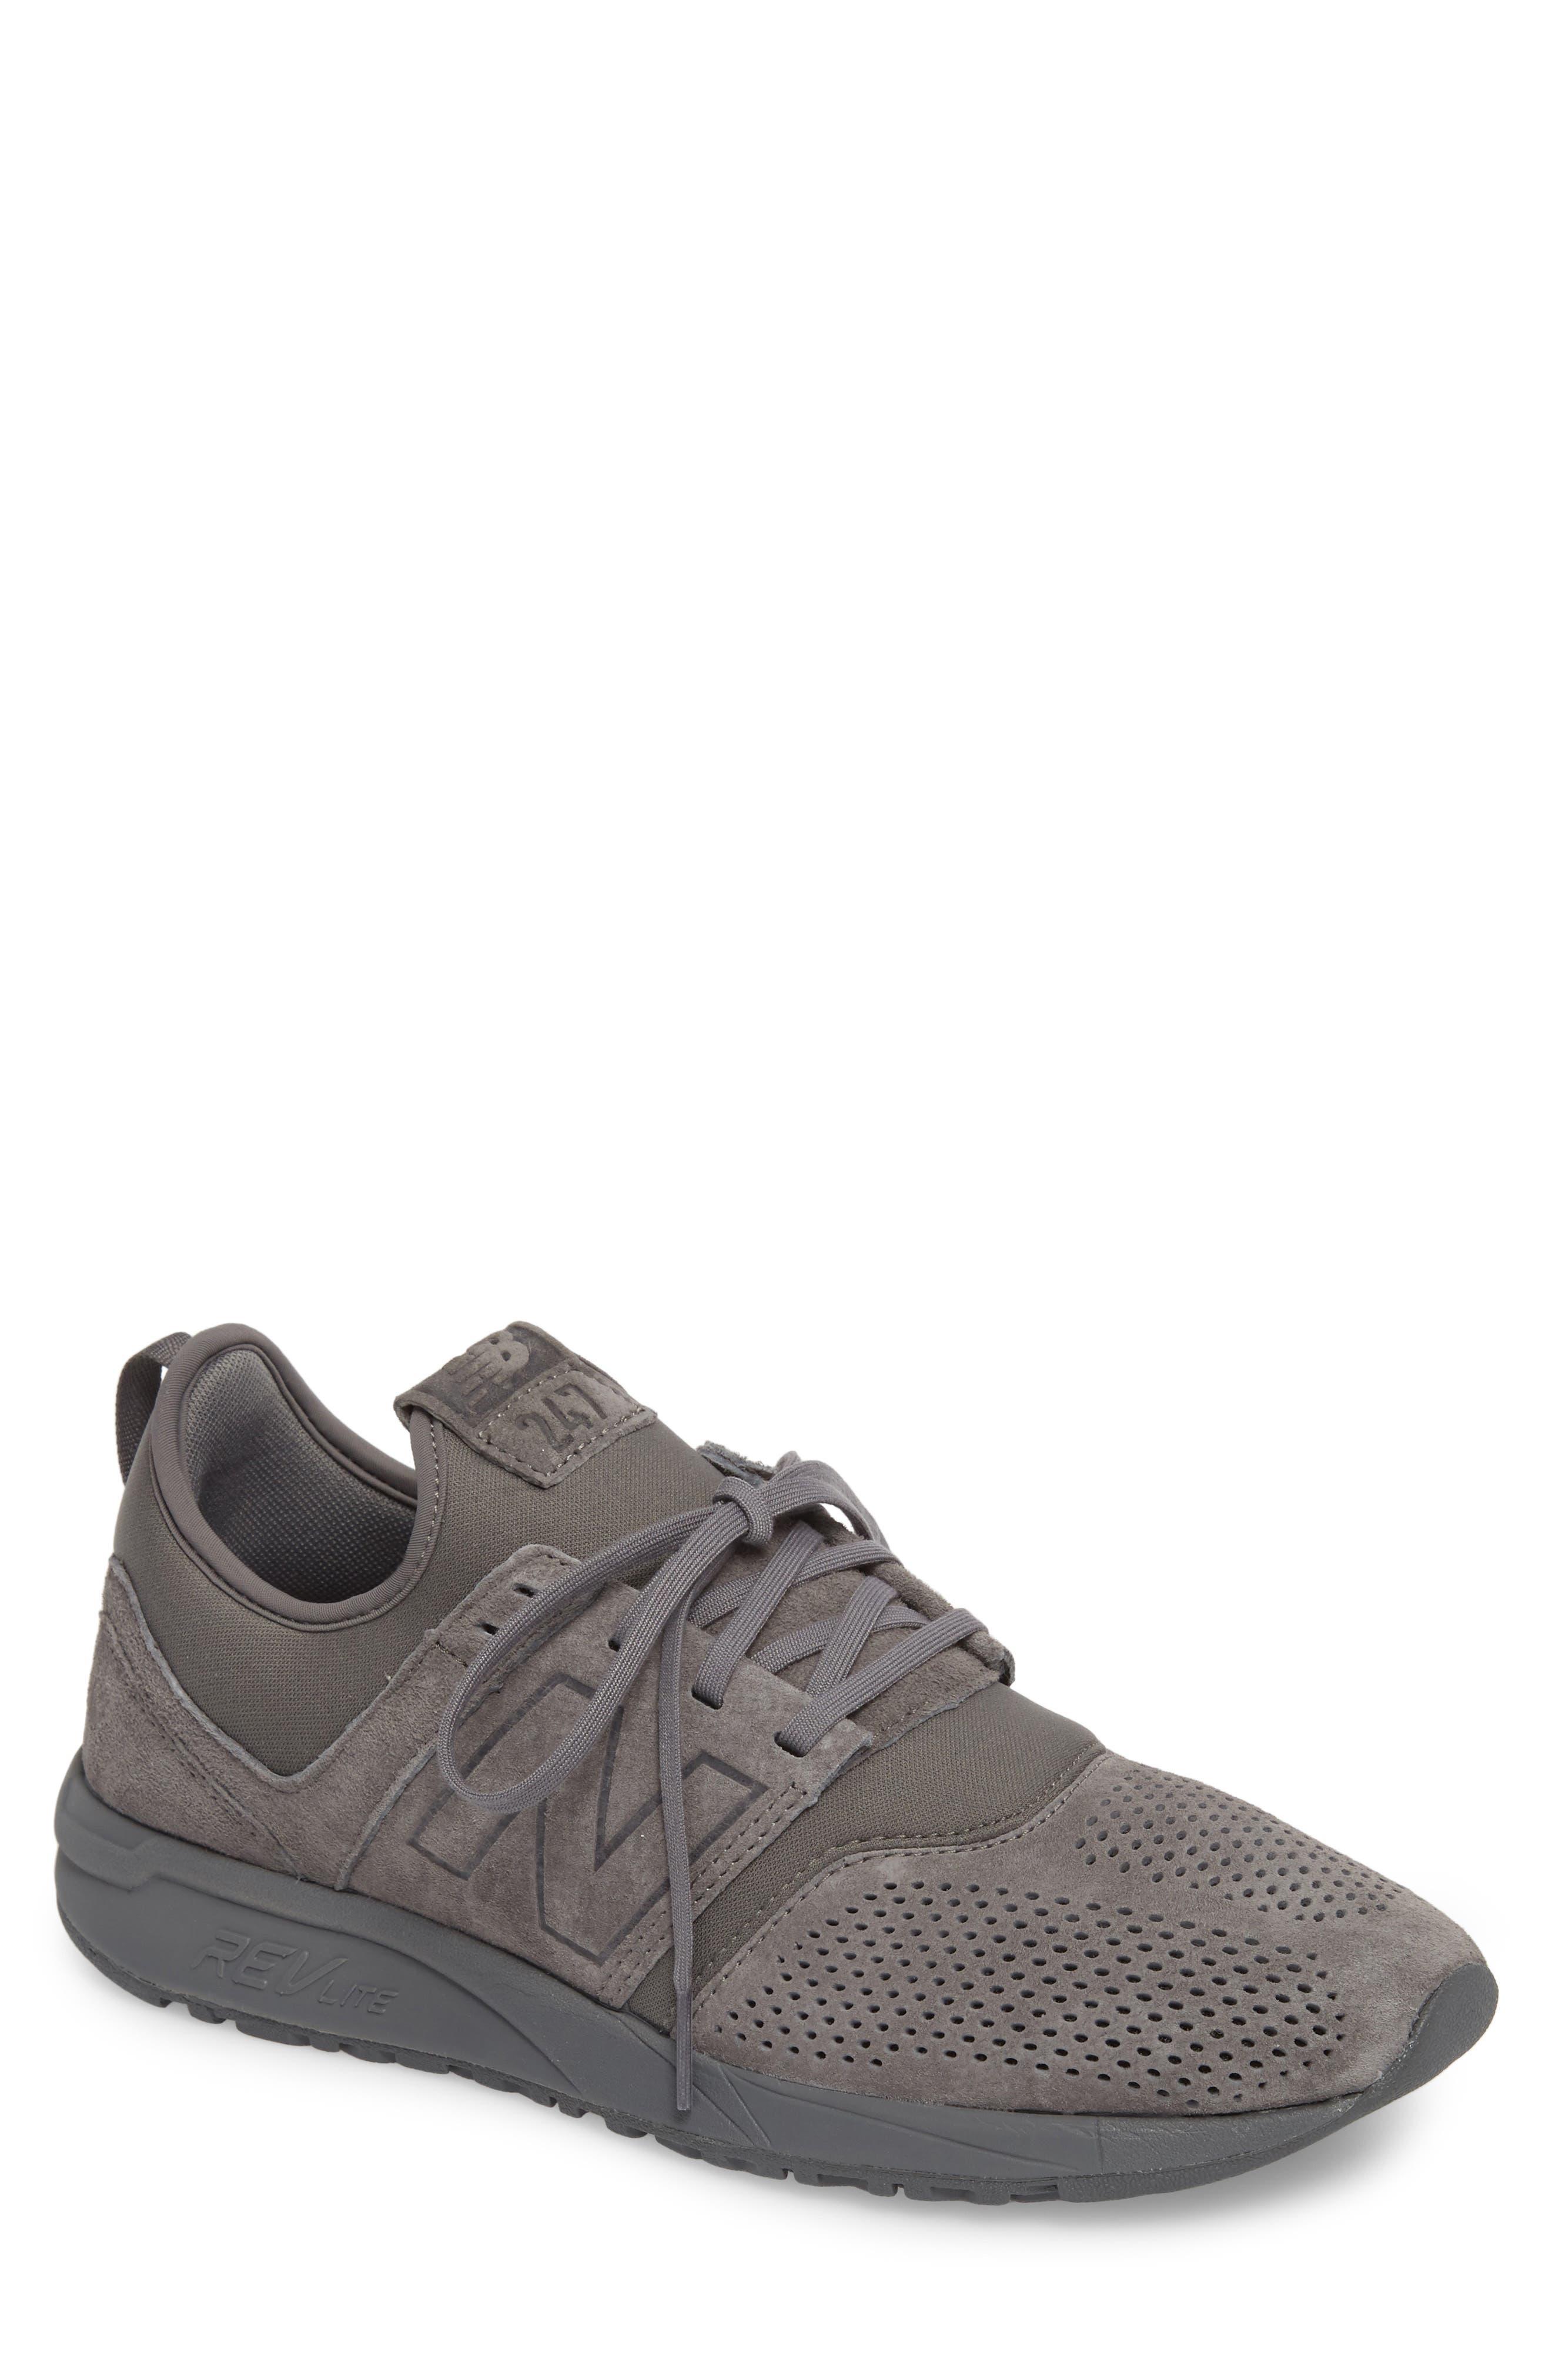 MRL247 Sneaker,                             Main thumbnail 1, color,                             Grey